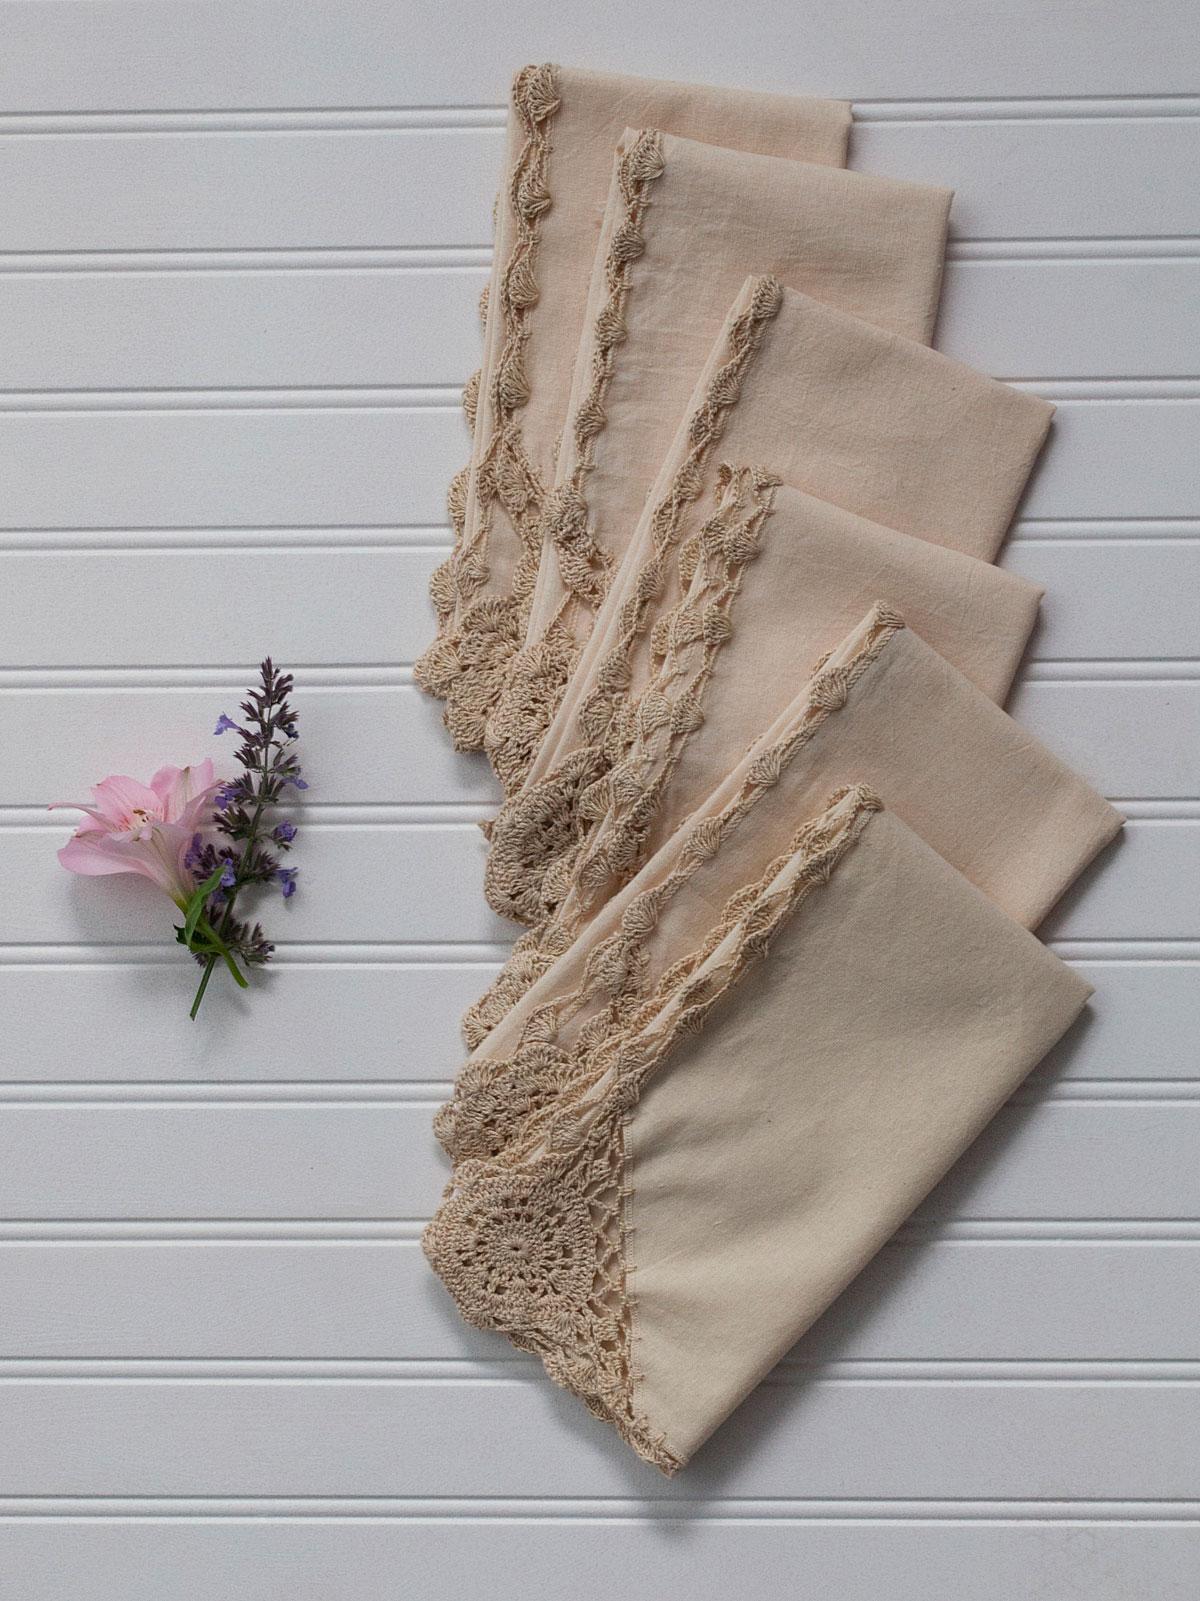 Cora's Crochet Trim Napkins Set of 6 - Antique